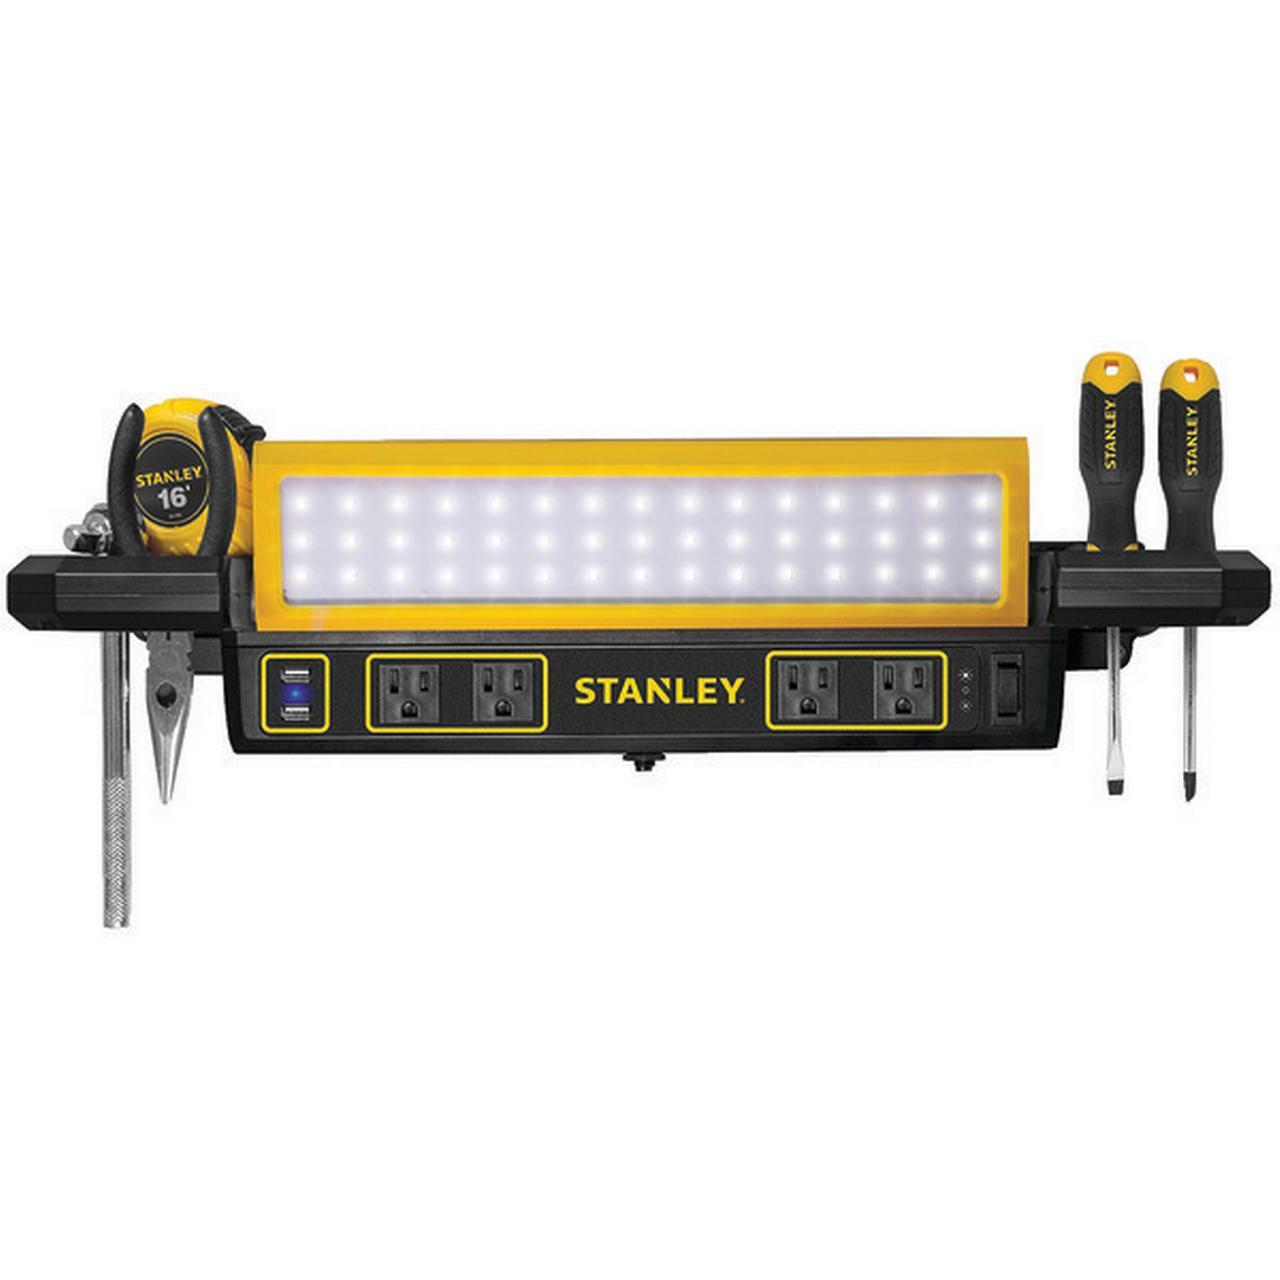 STANLEY(R) PSL1000S 1,000-Lumen Workbench Shop Light with Power Strip